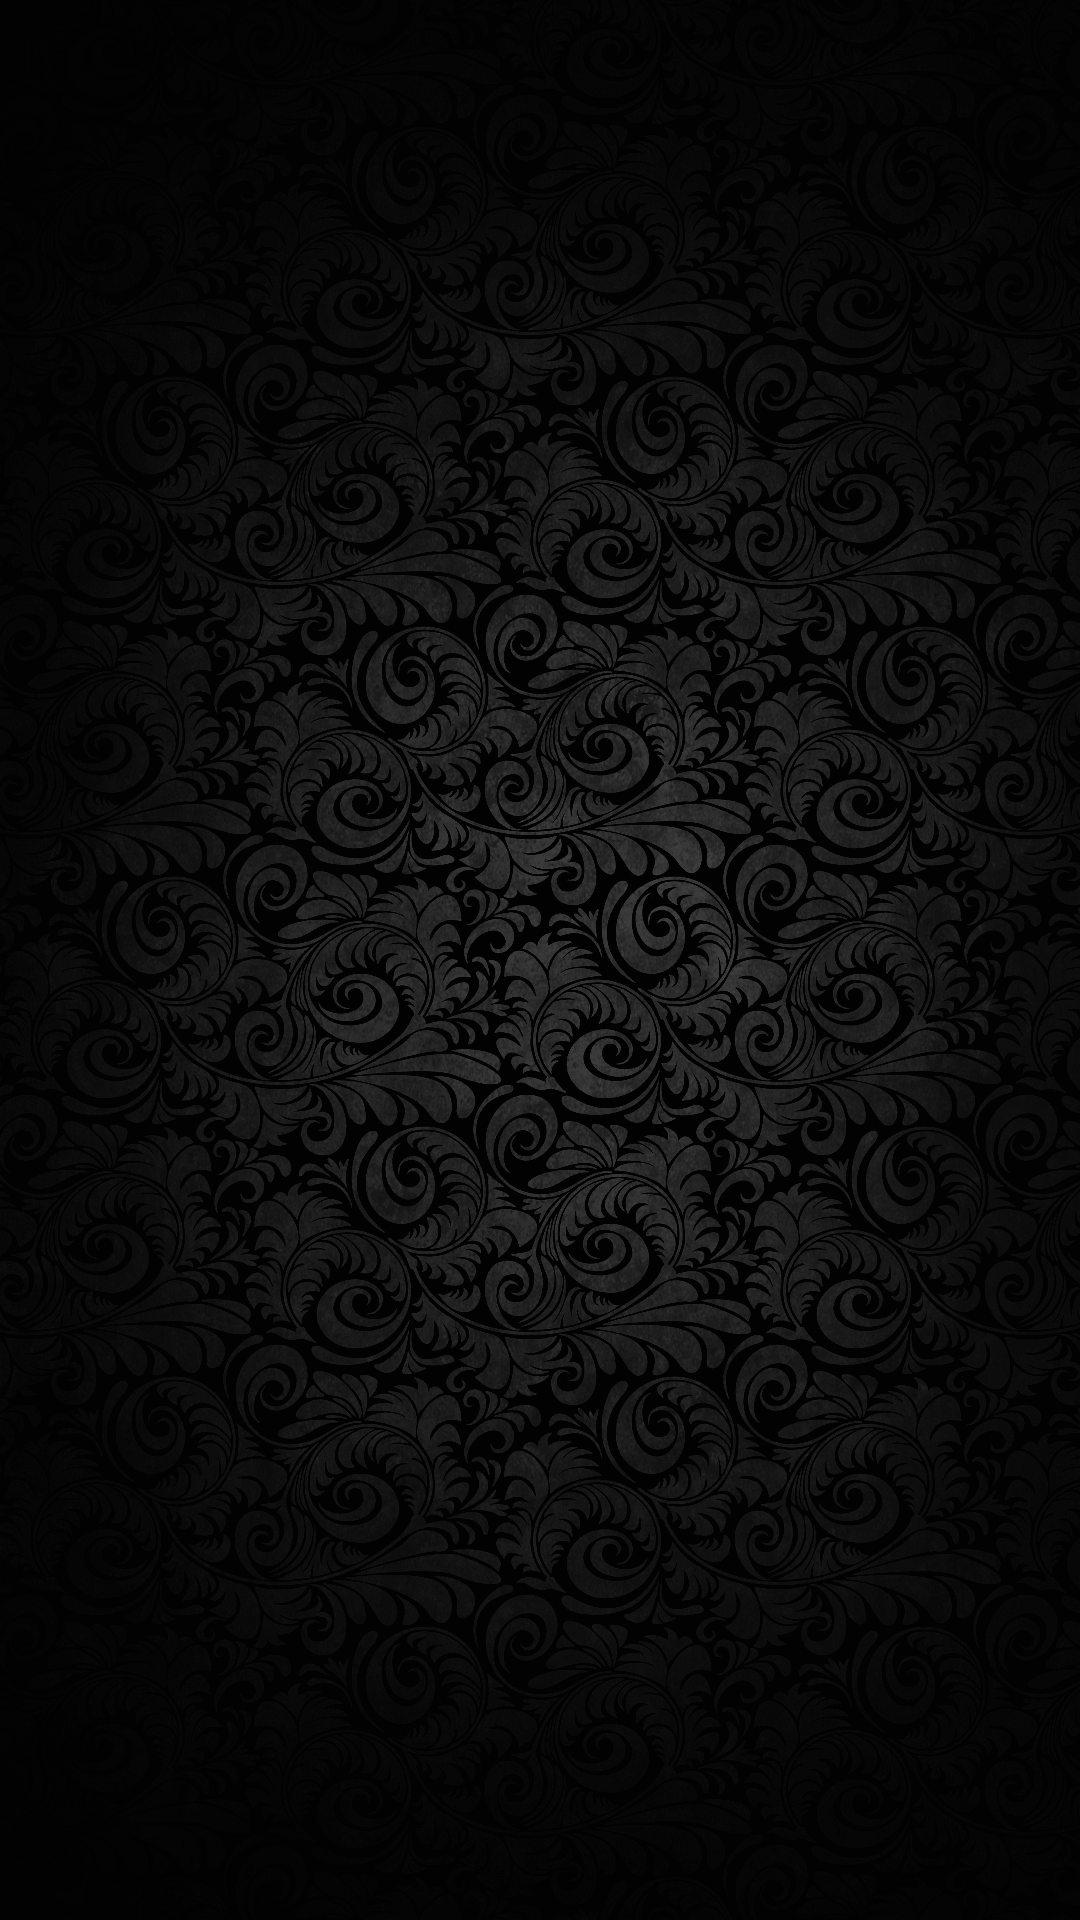 com/wallpaper-full-hd-1080-x-1920-smartphone-dark-elegant.php